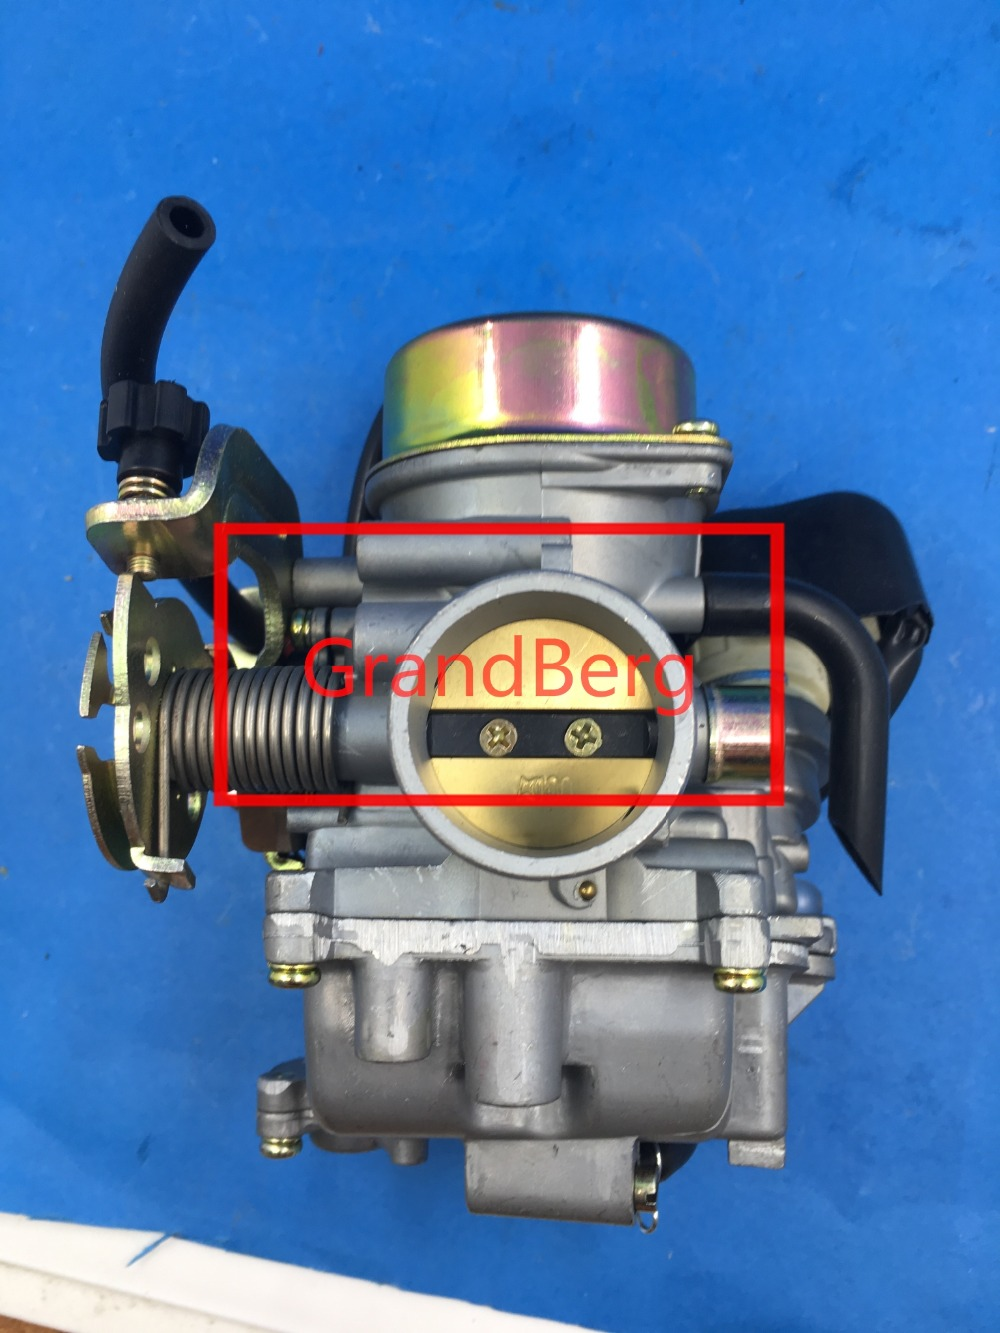 cvk 30mm  carb  carburetor CVK carburetor  for 150cc~250cc Racing scooter,motorcycle.